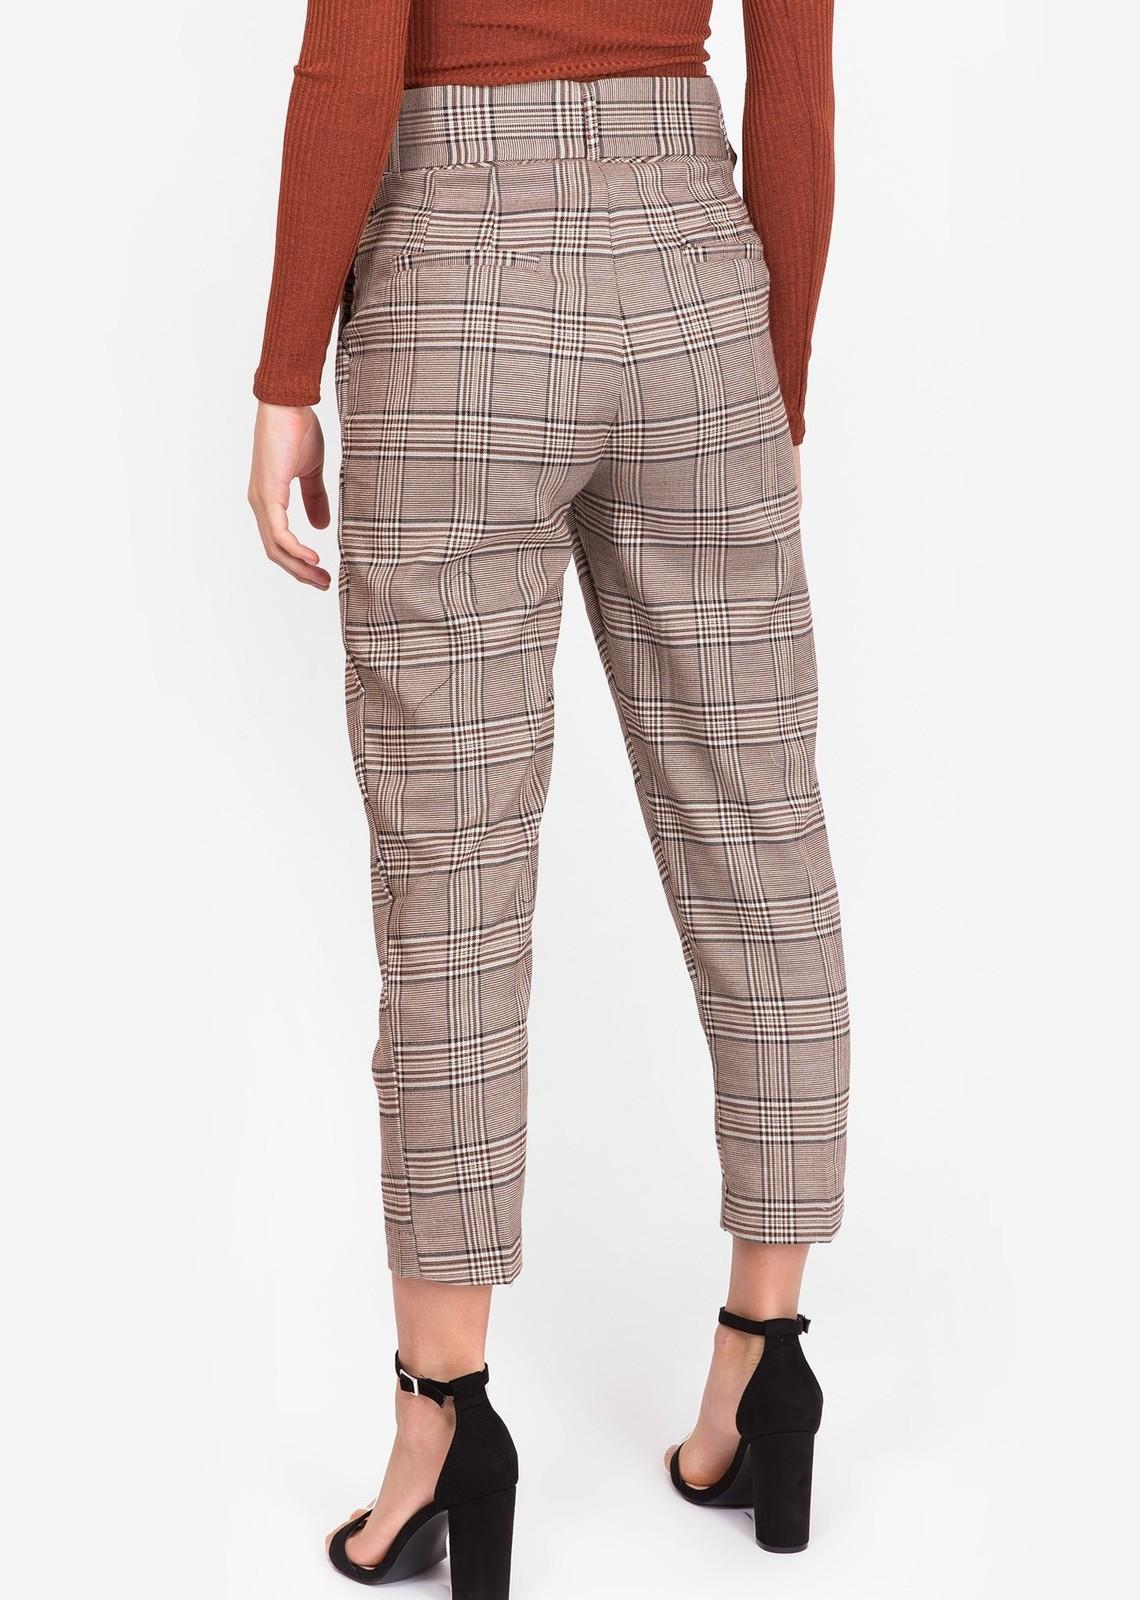 Belted pantalon